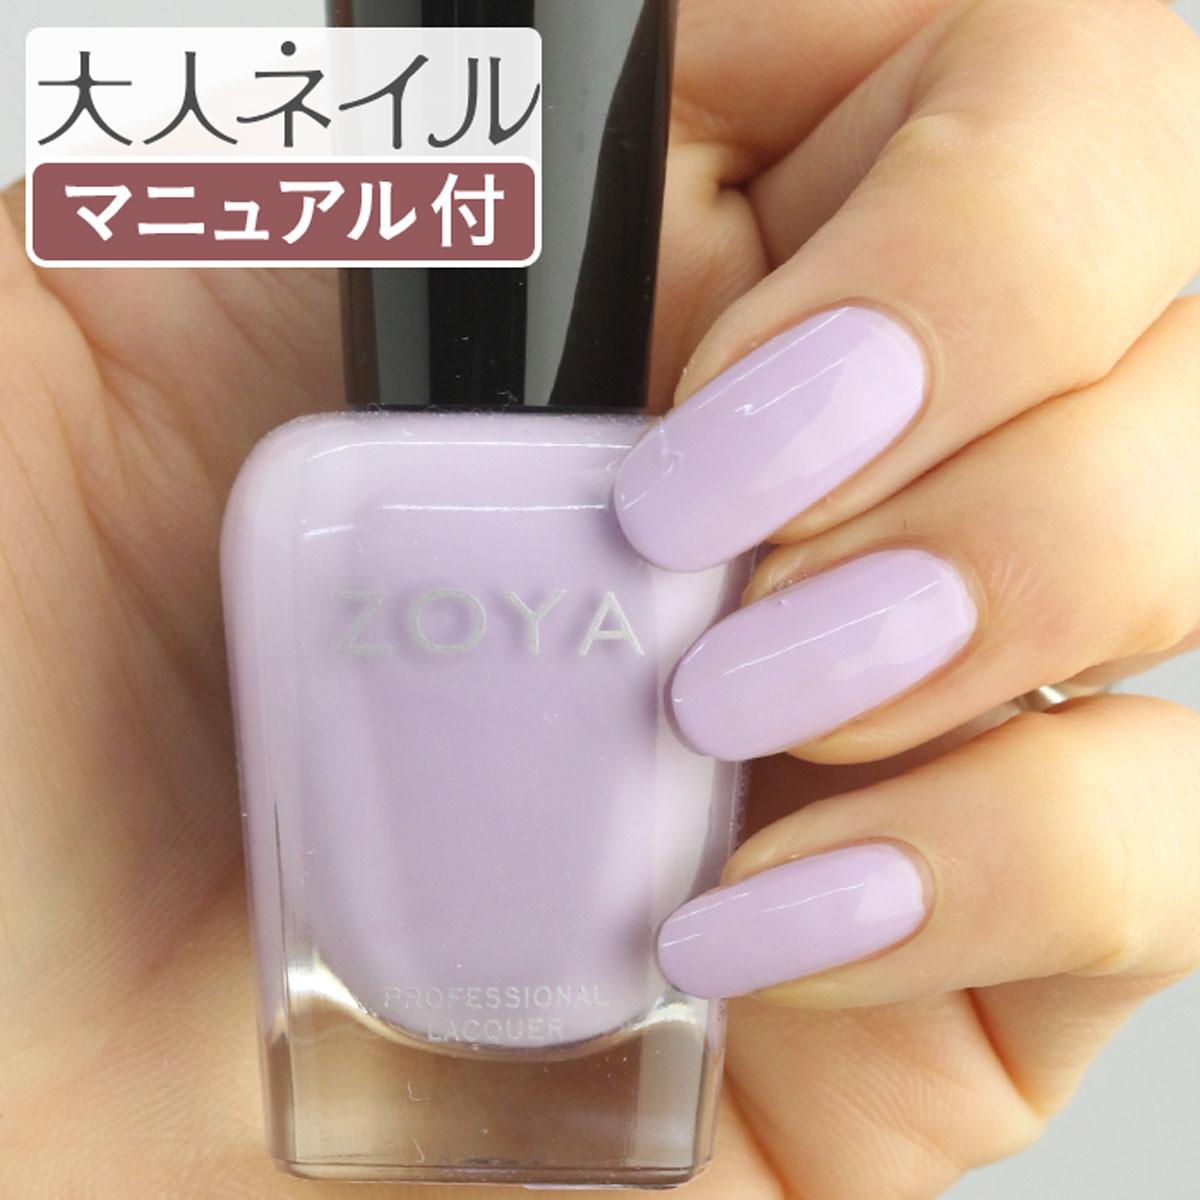 ZOYA ゾーヤ ゾヤ ネイルカラー ZP887 15mL Abby CHARMING 自爪 の為に作られた ネイル にやさしい 自然派 マニキュア zoya セルフネイル にもおすすめ ラベンダー 紫 春ネイル 春カラー